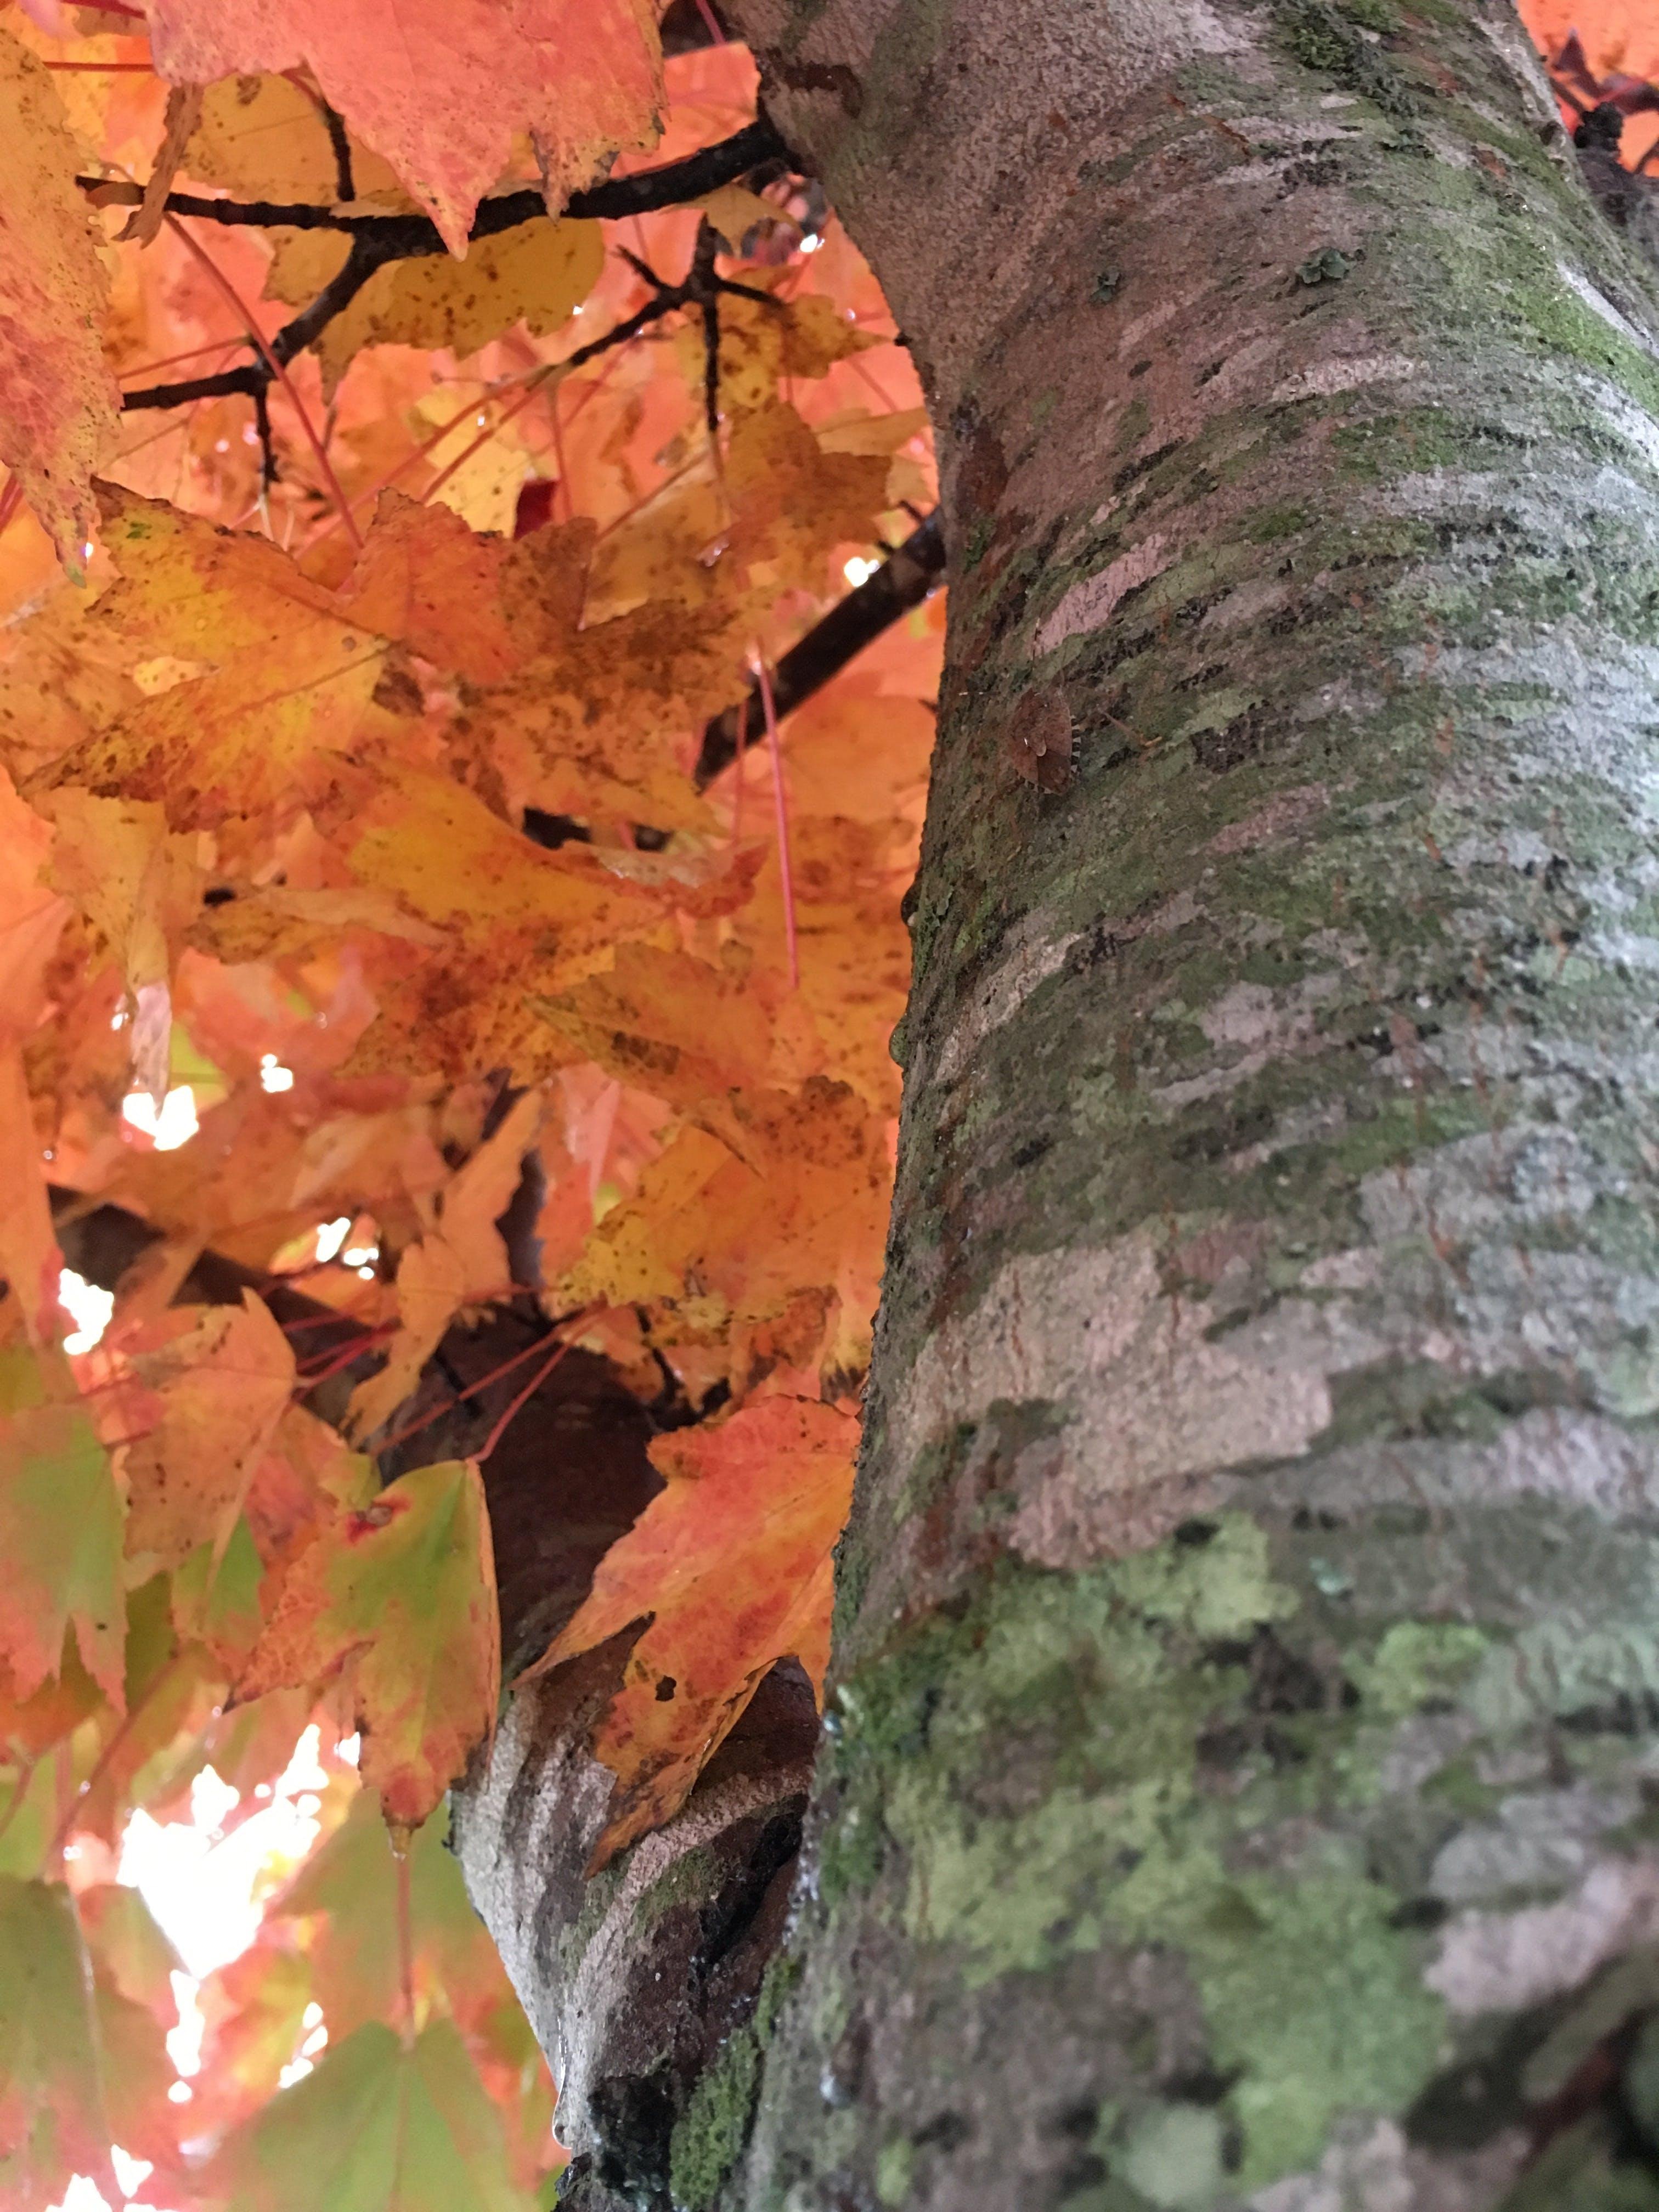 Free stock photo of tree, fall, bark, lichen